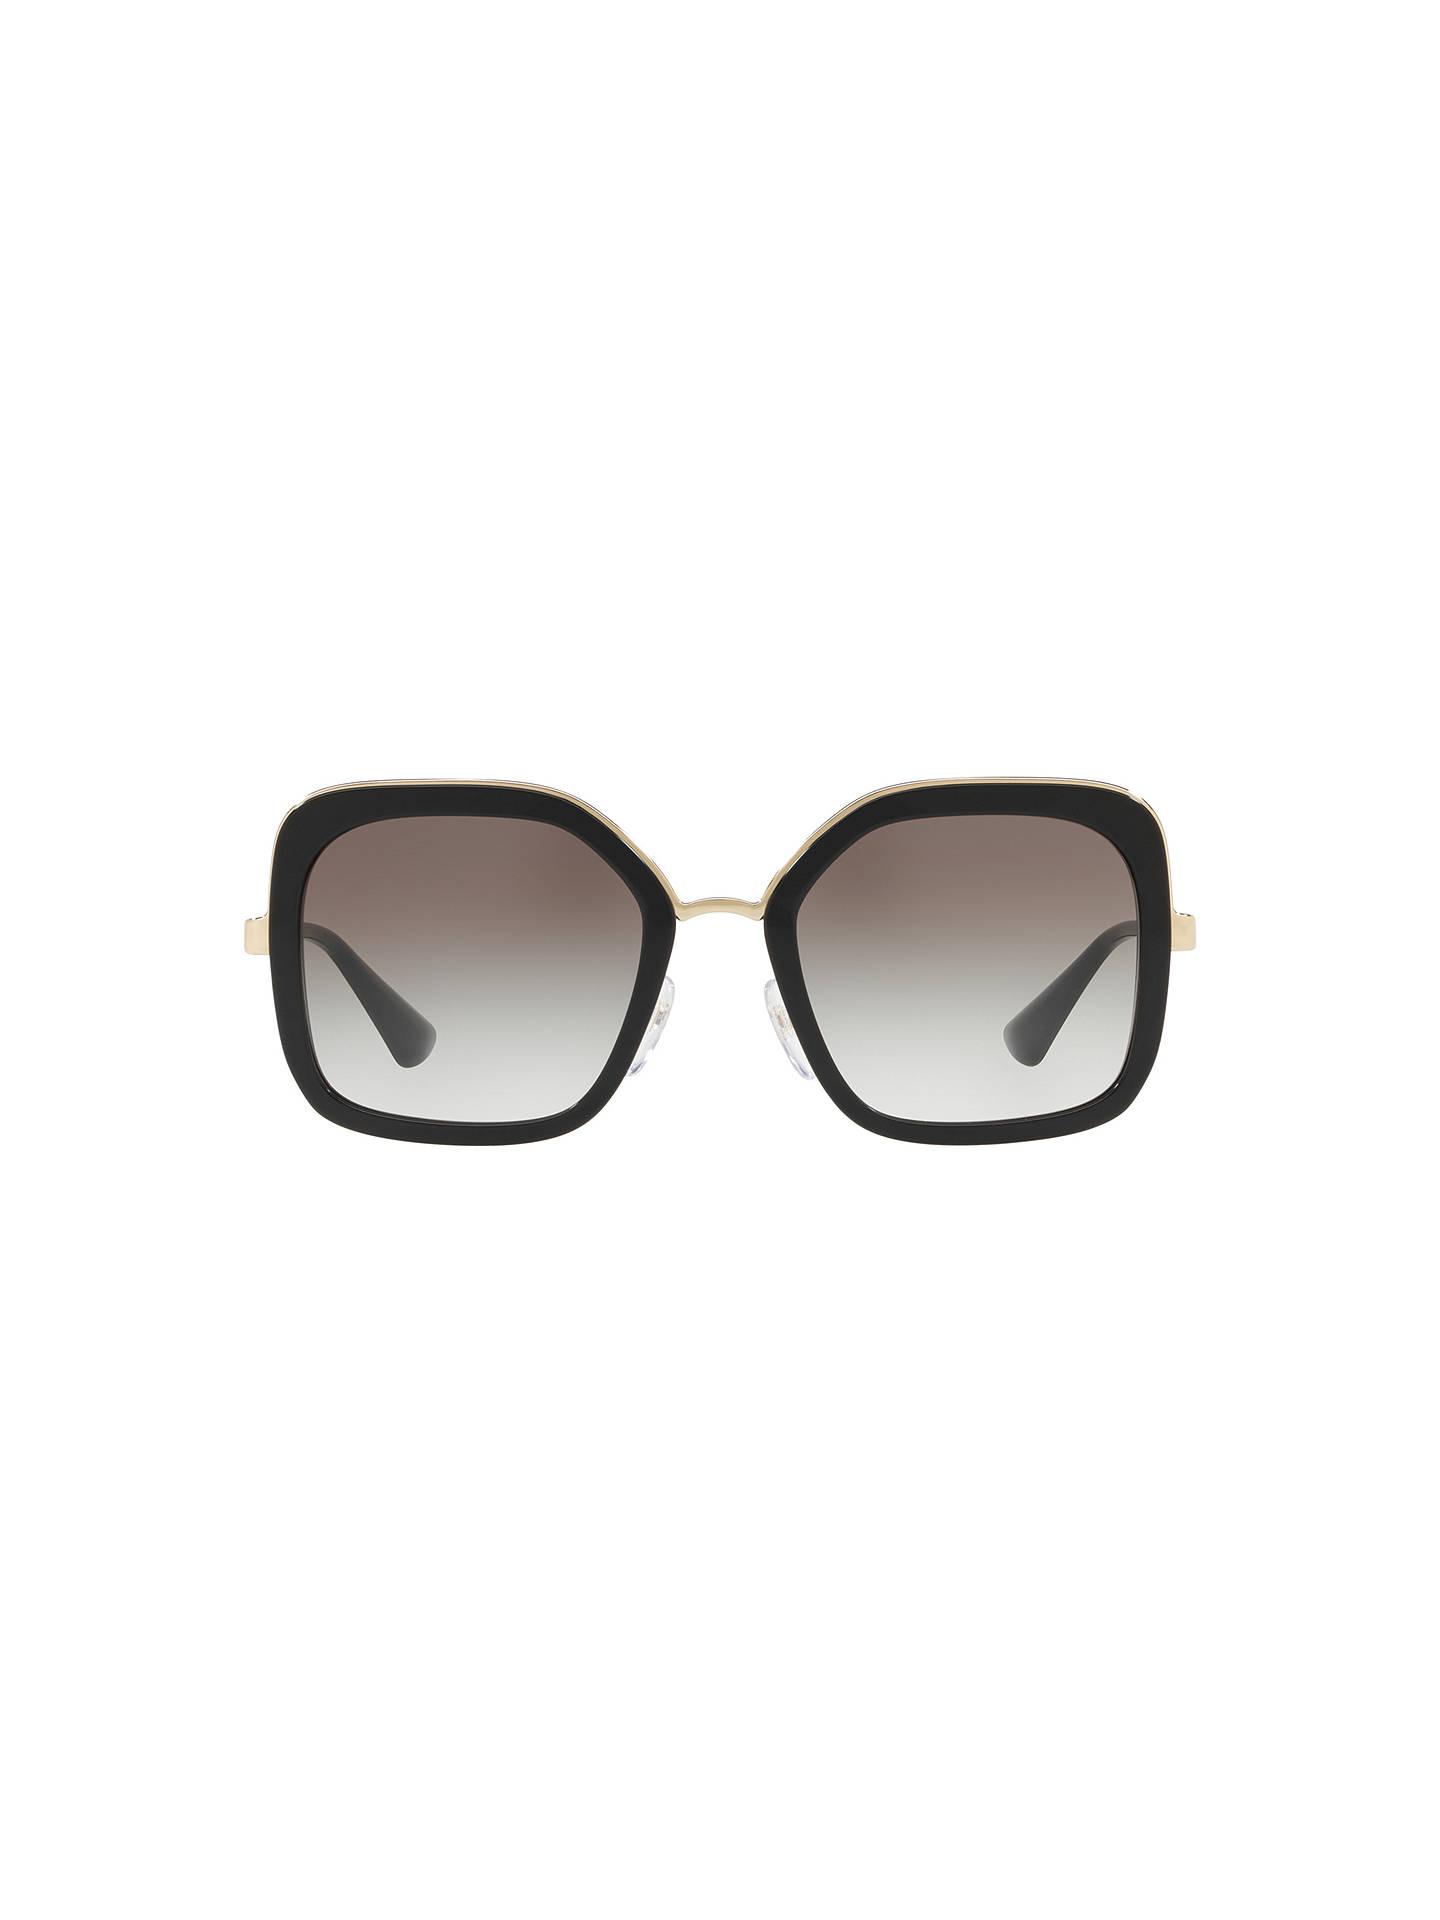 ea11c14600eb Prada PR 57US Women s Square Sunglasses at John Lewis   Partners